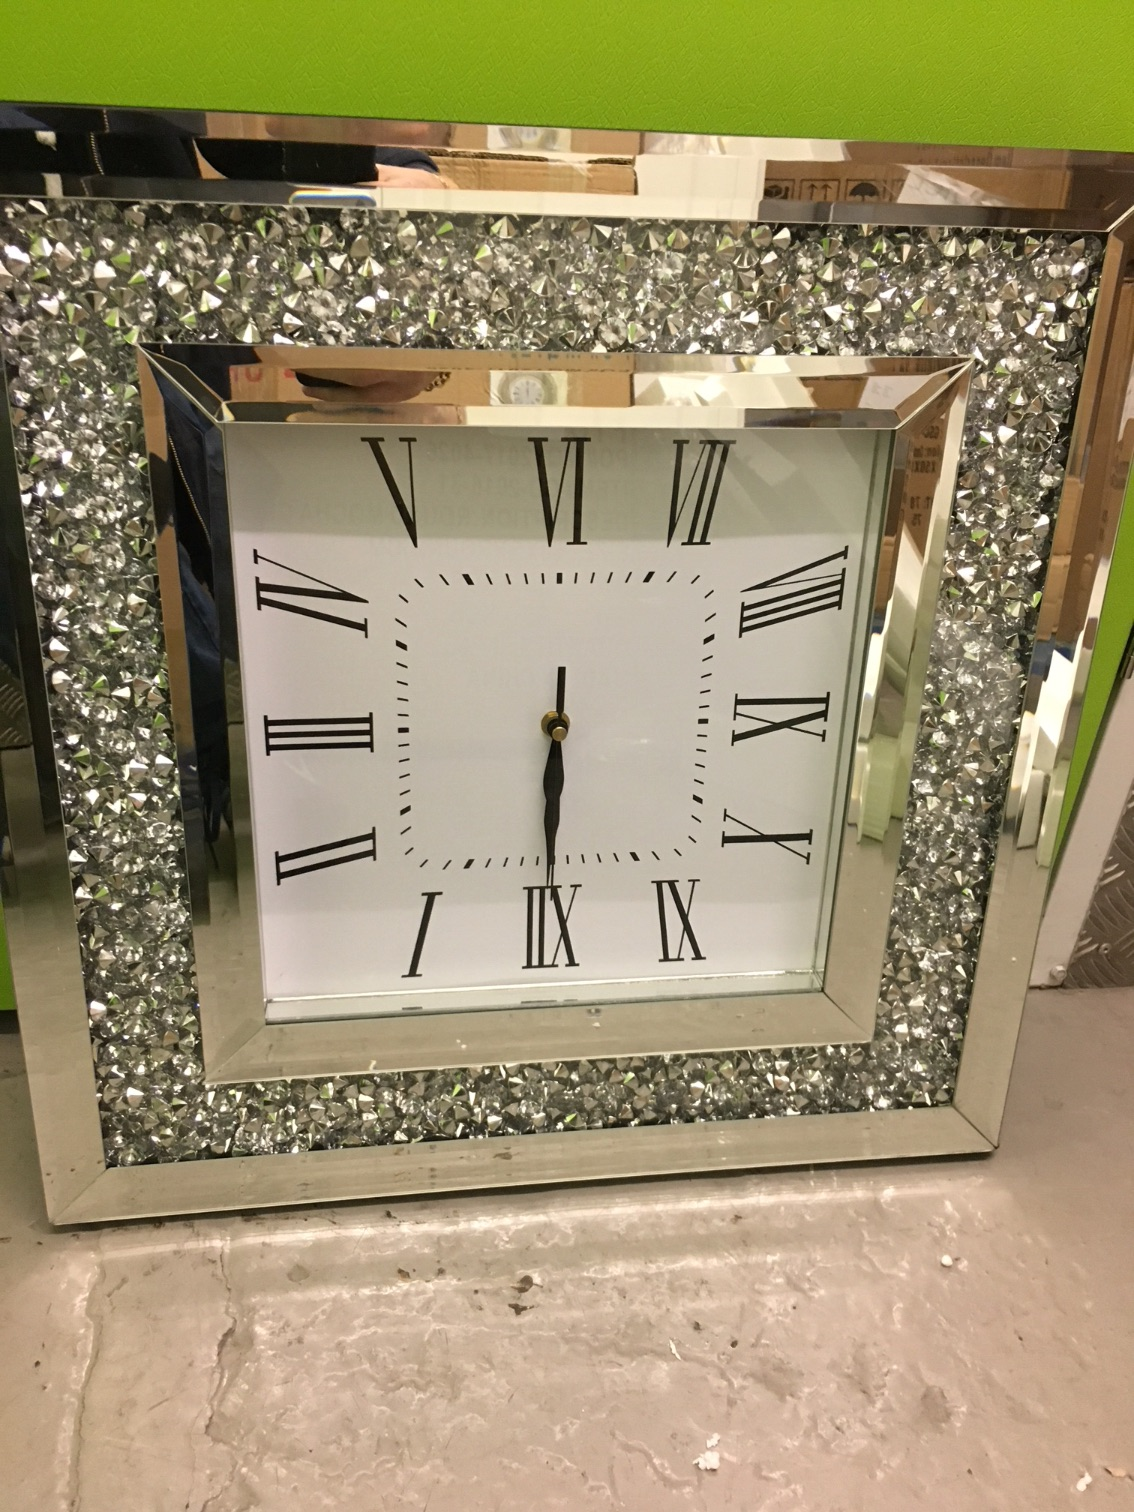 New Diamond Crush Sparkle Large Crystal Mirrored Clock